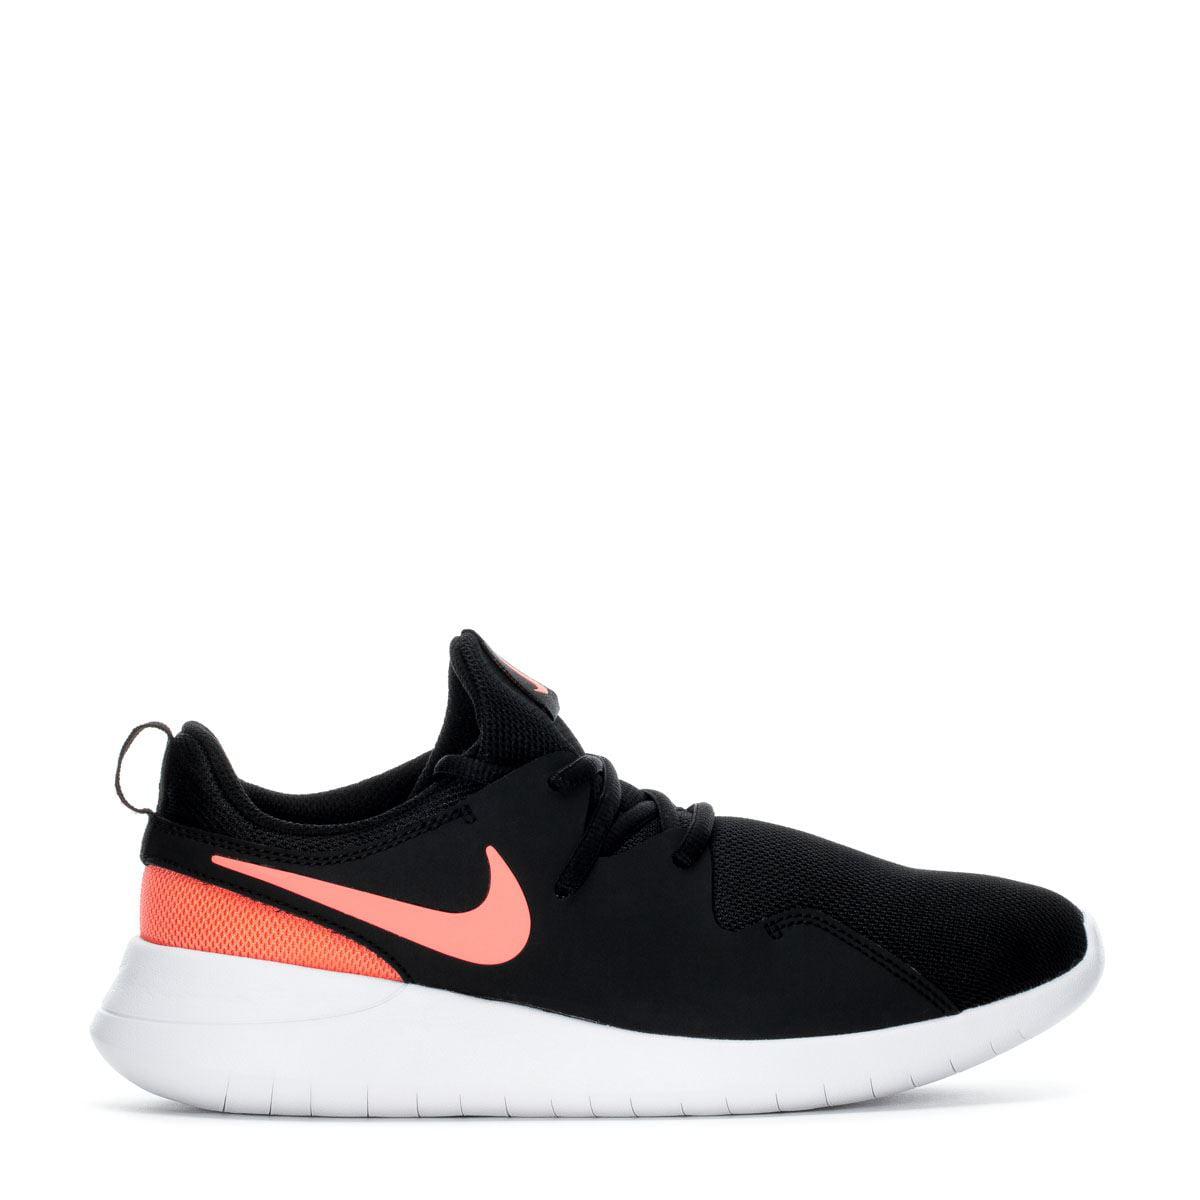 Nike - Nike Tessen Girls Sneakers